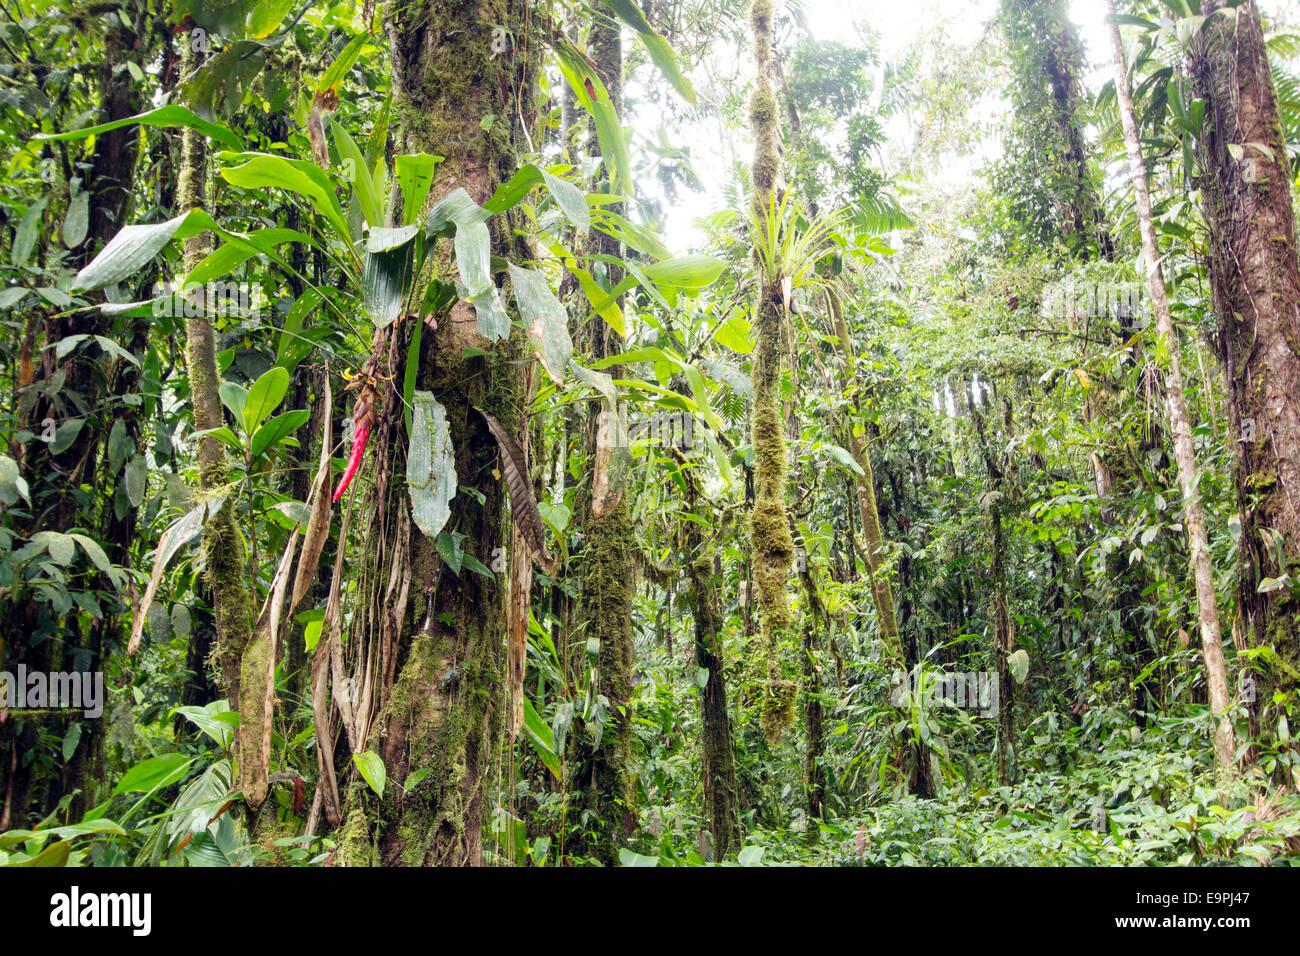 Innere Troipcal Regenwald nahe Sumaco National Park im ecuadorianischen Amazonasgebiet. Mit einem Pitcairnea Bromelie Stockbild